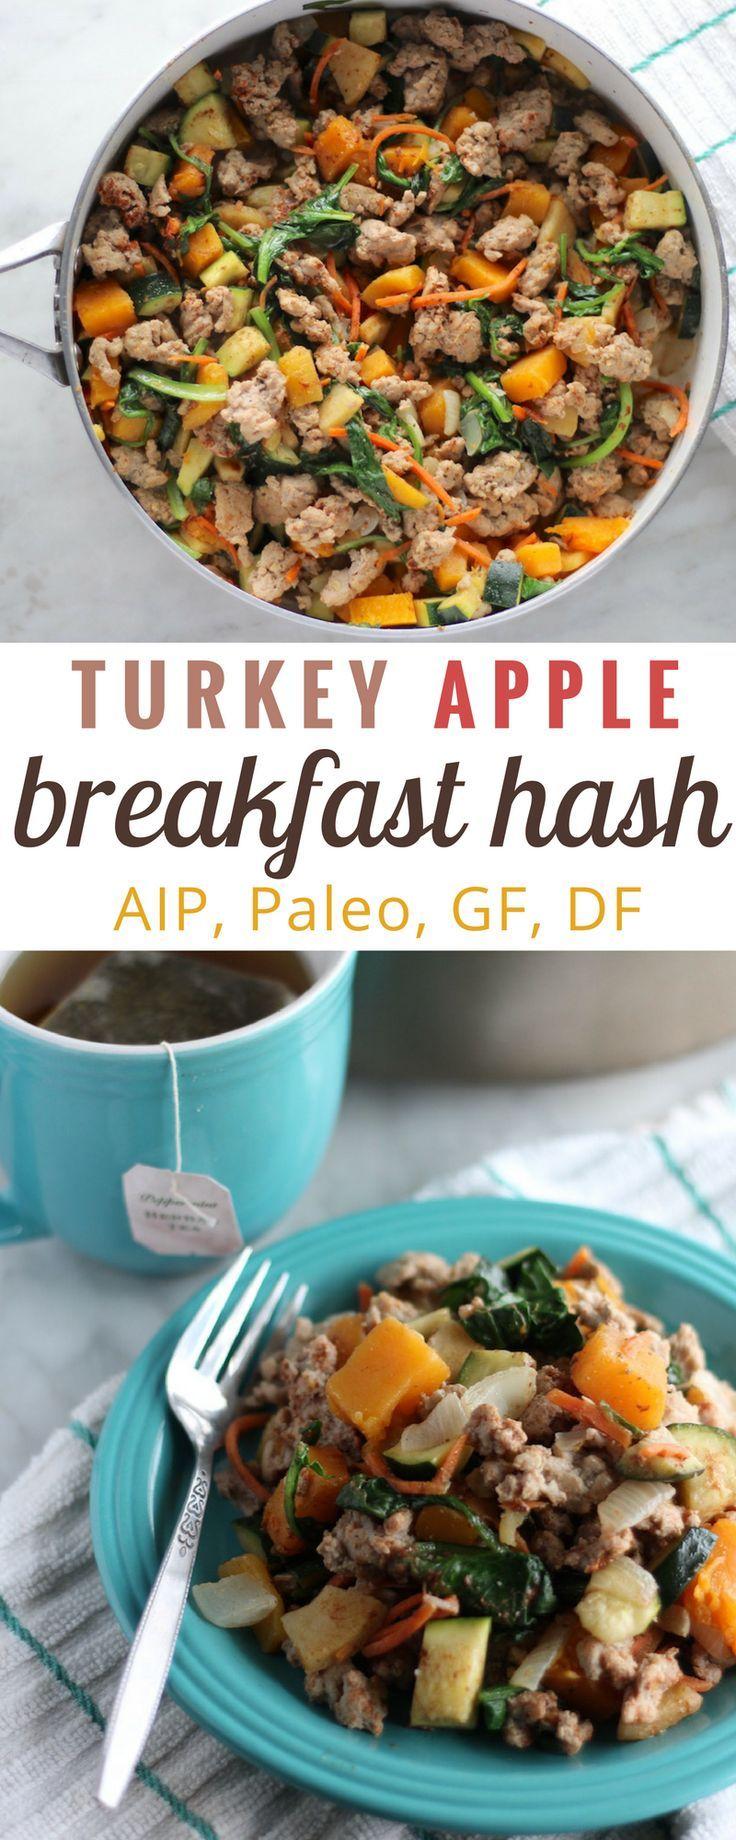 Turkey Apple Breakfast Hash (AIP) Recipe Elimination